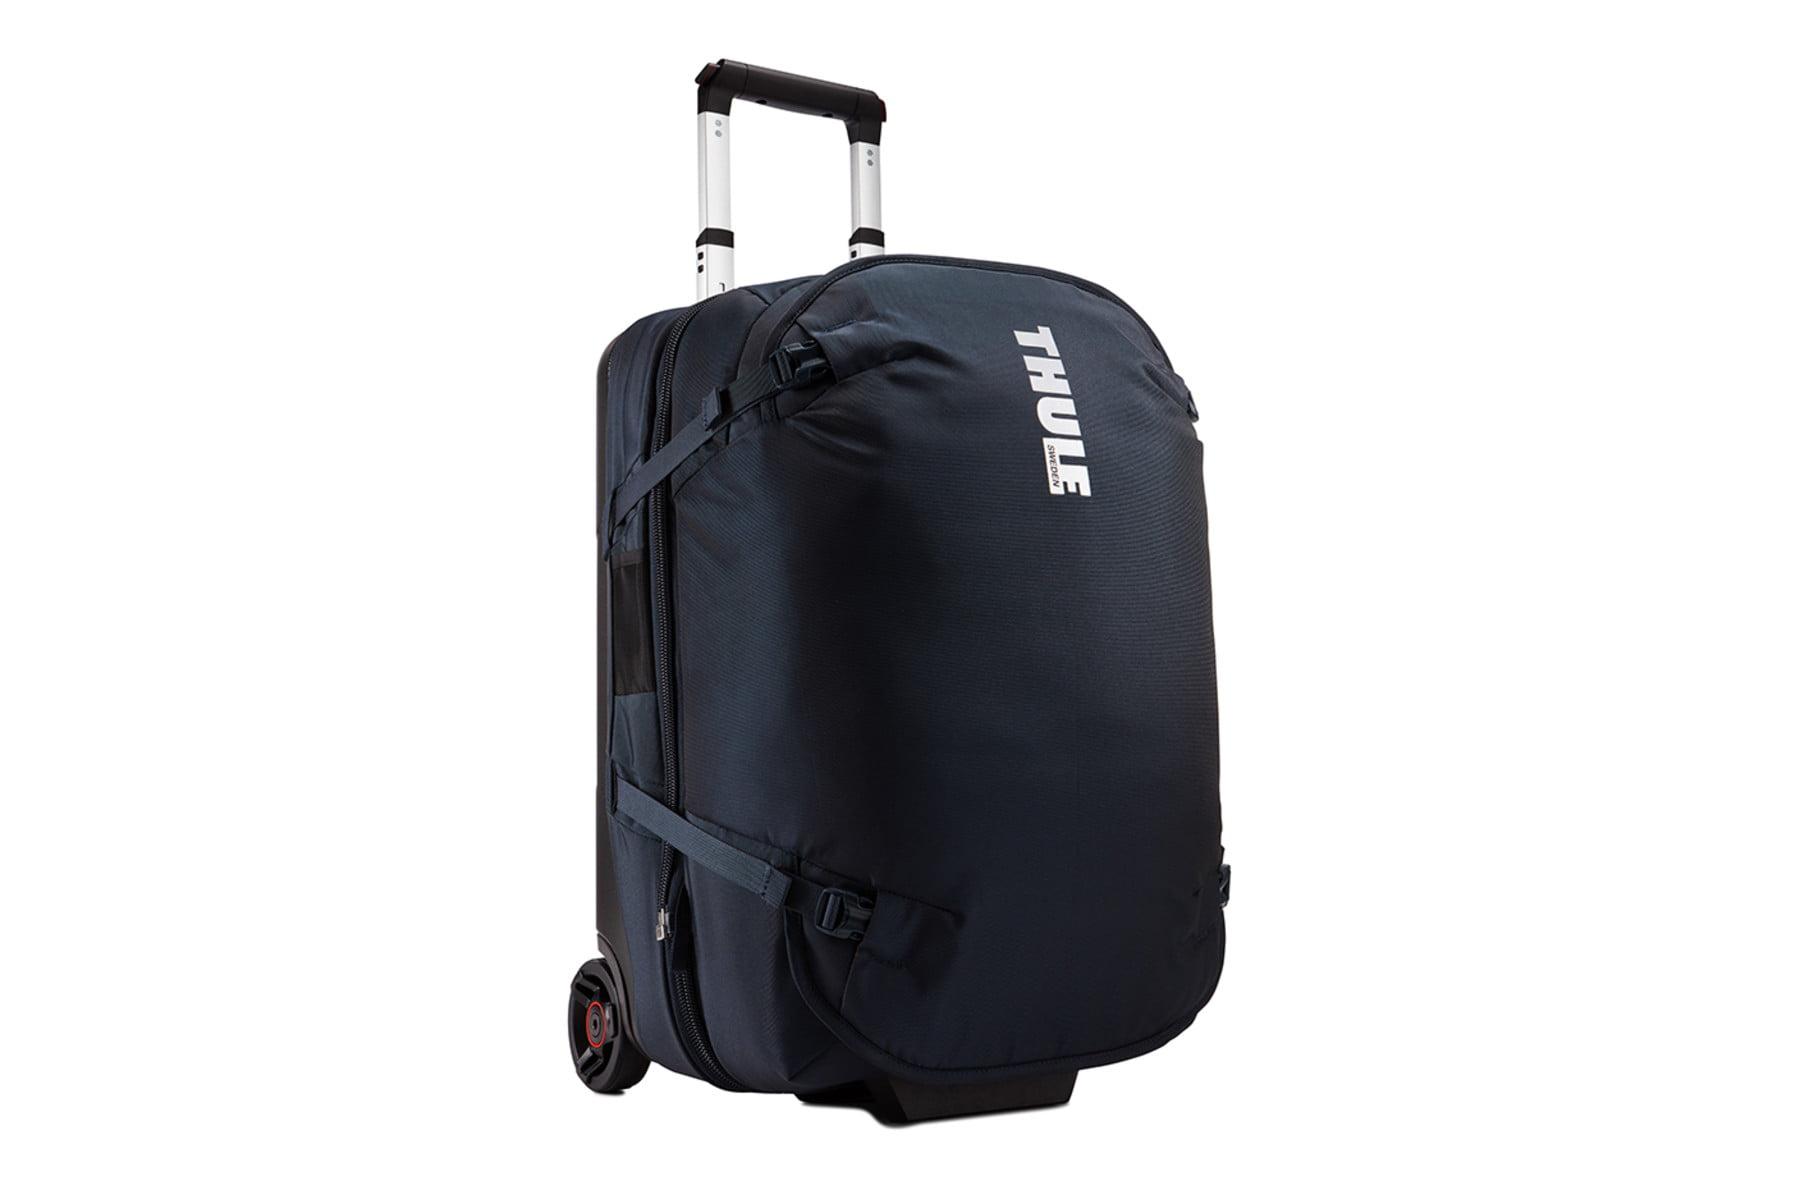 Geanta voiaj Thule Subterra Luggage 55cm22 Mineral 4